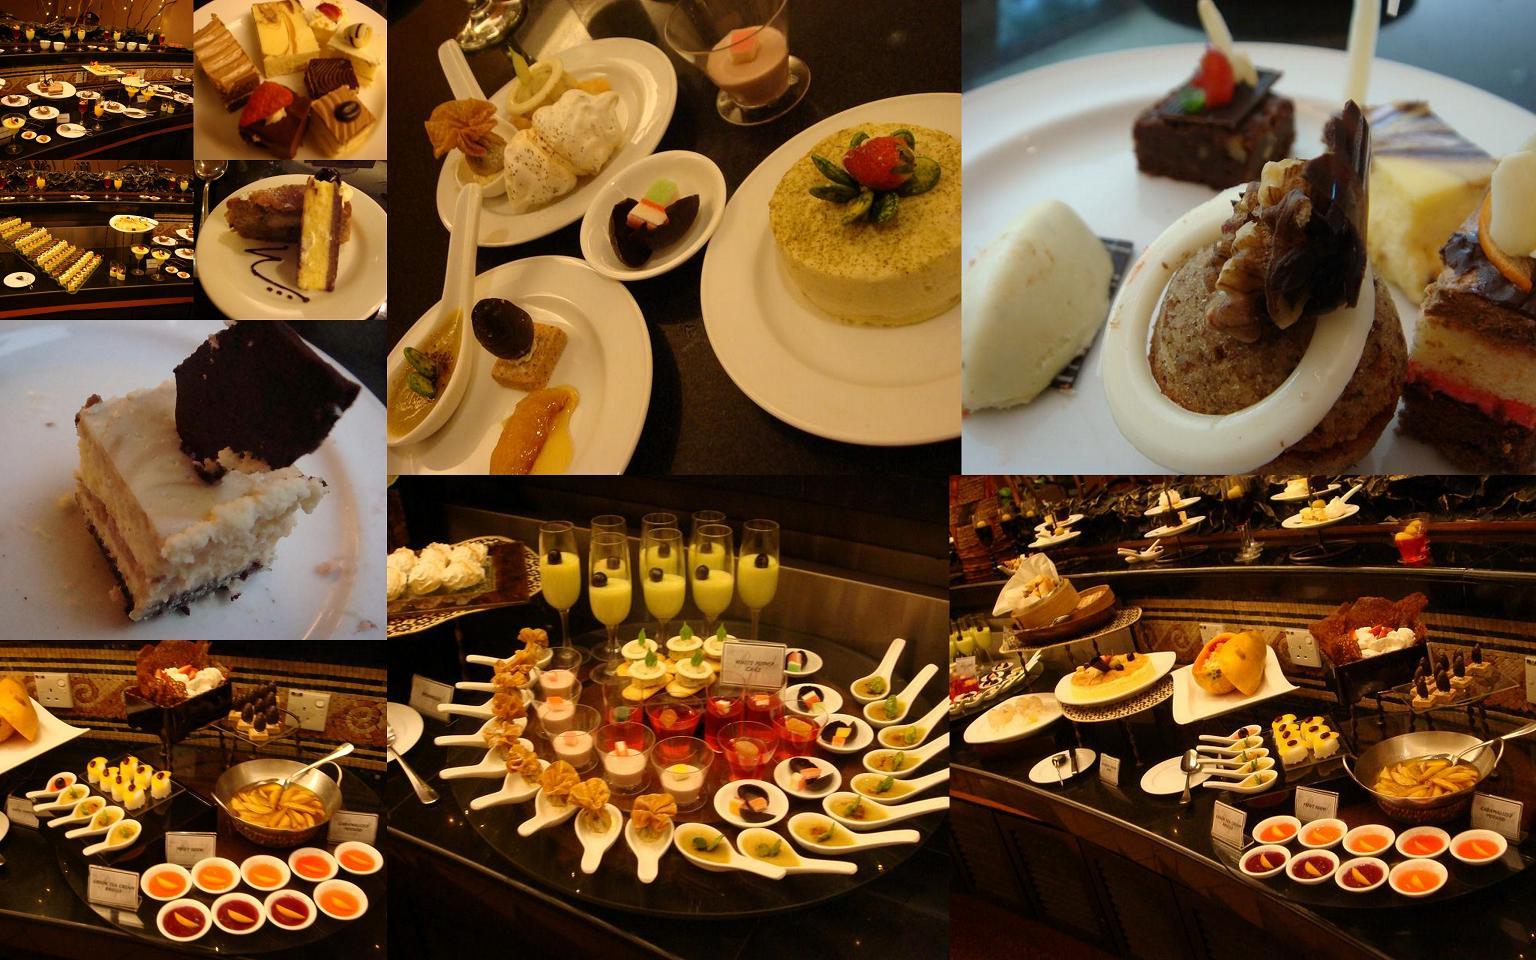 Restaurant Asiatique Buffet  Ef Bf Bd Volont Ef Bf Bd M Ef Bf Bdcon